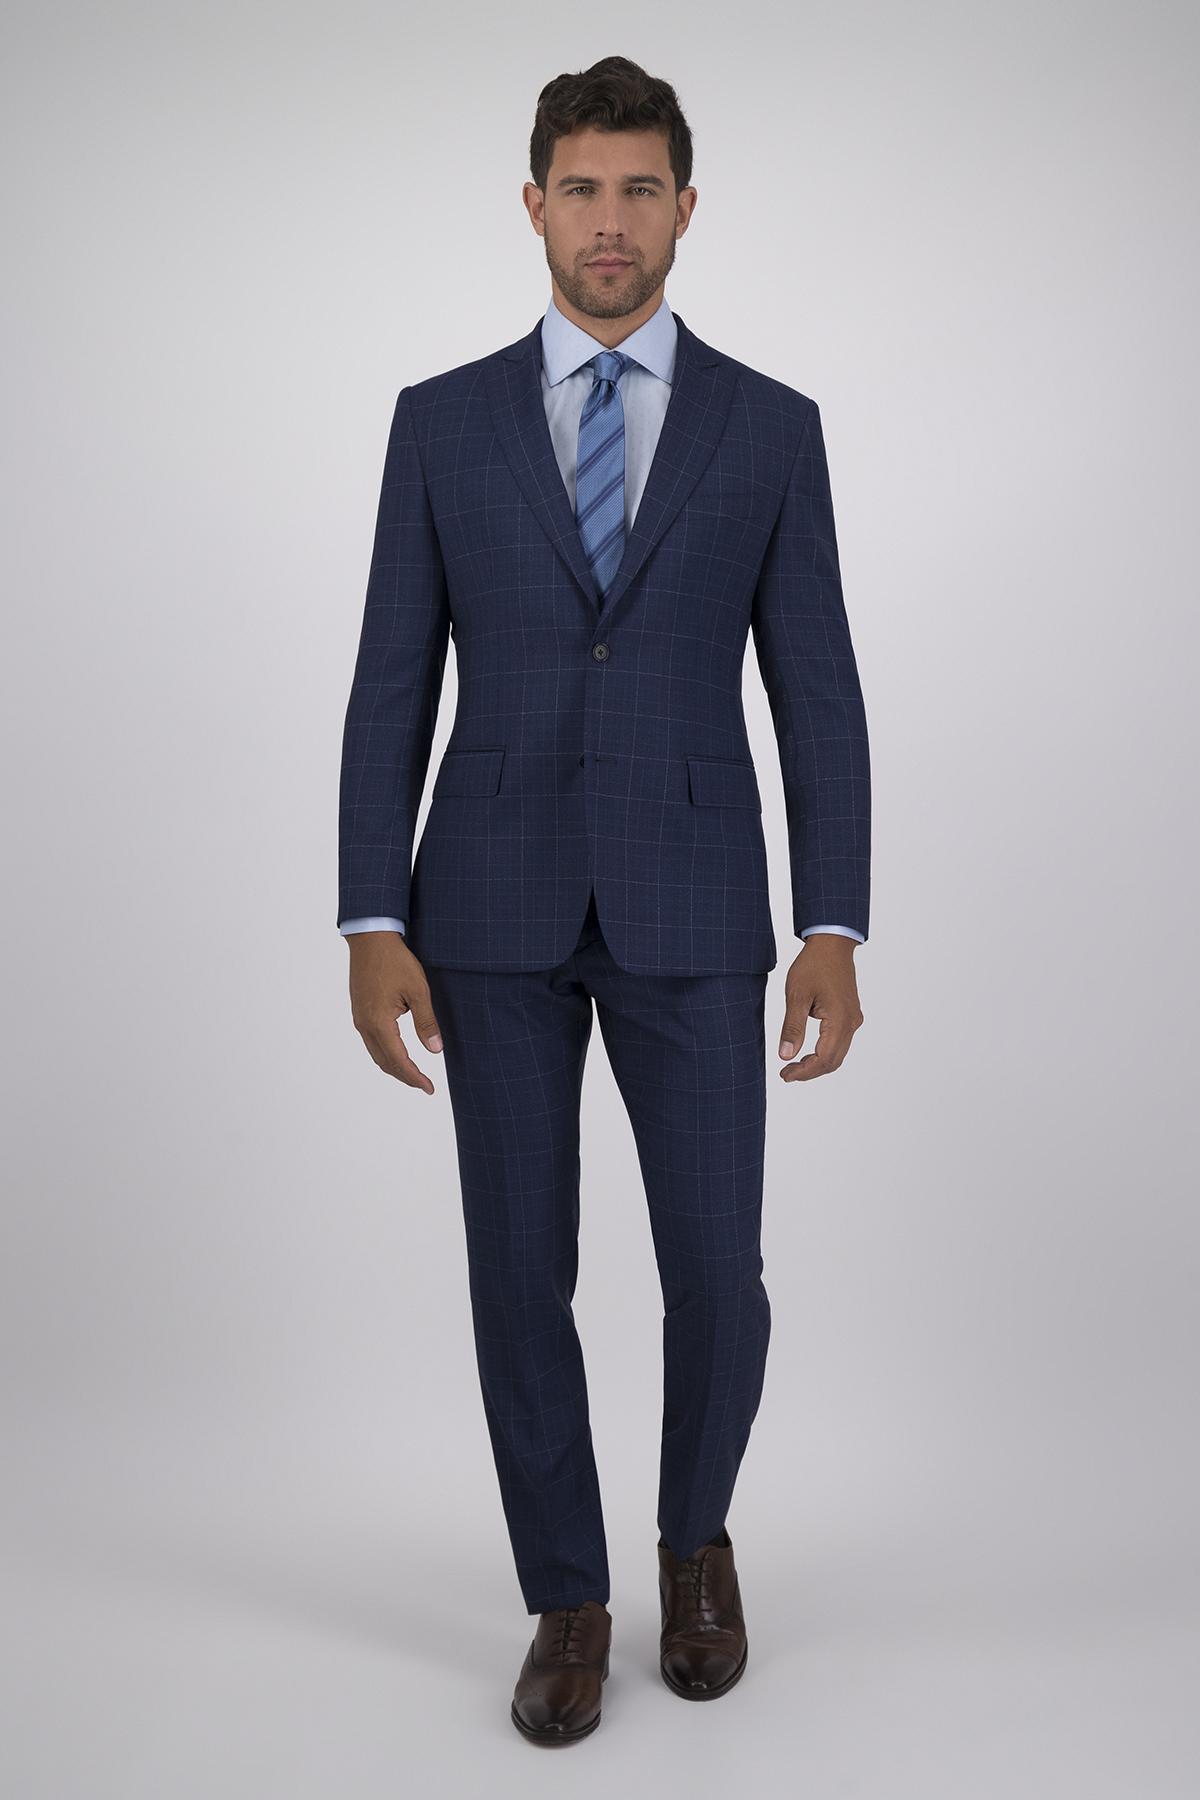 Traje Calderoni Couture Azul Principe Gales con Tejido super 150´s Lana 100% Corte Slim , 2 Piezas